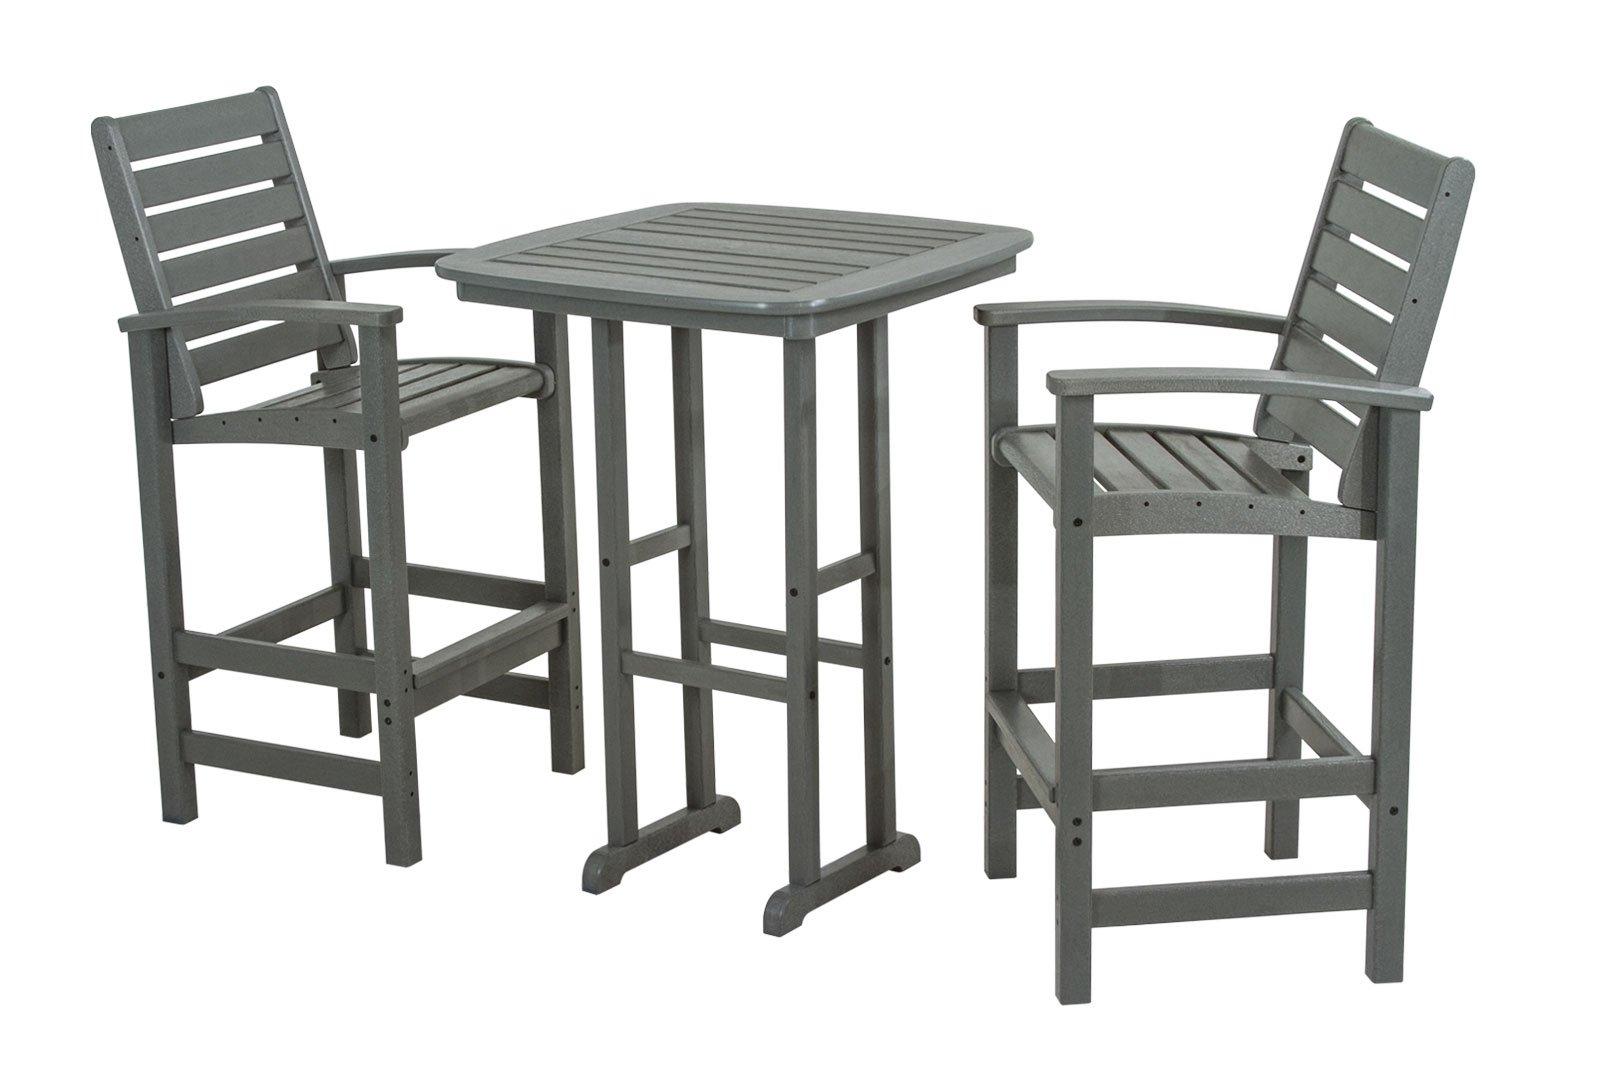 POLYWOOD PWS153-1-GY Signature 3-Piece Bar Set, Slate Grey